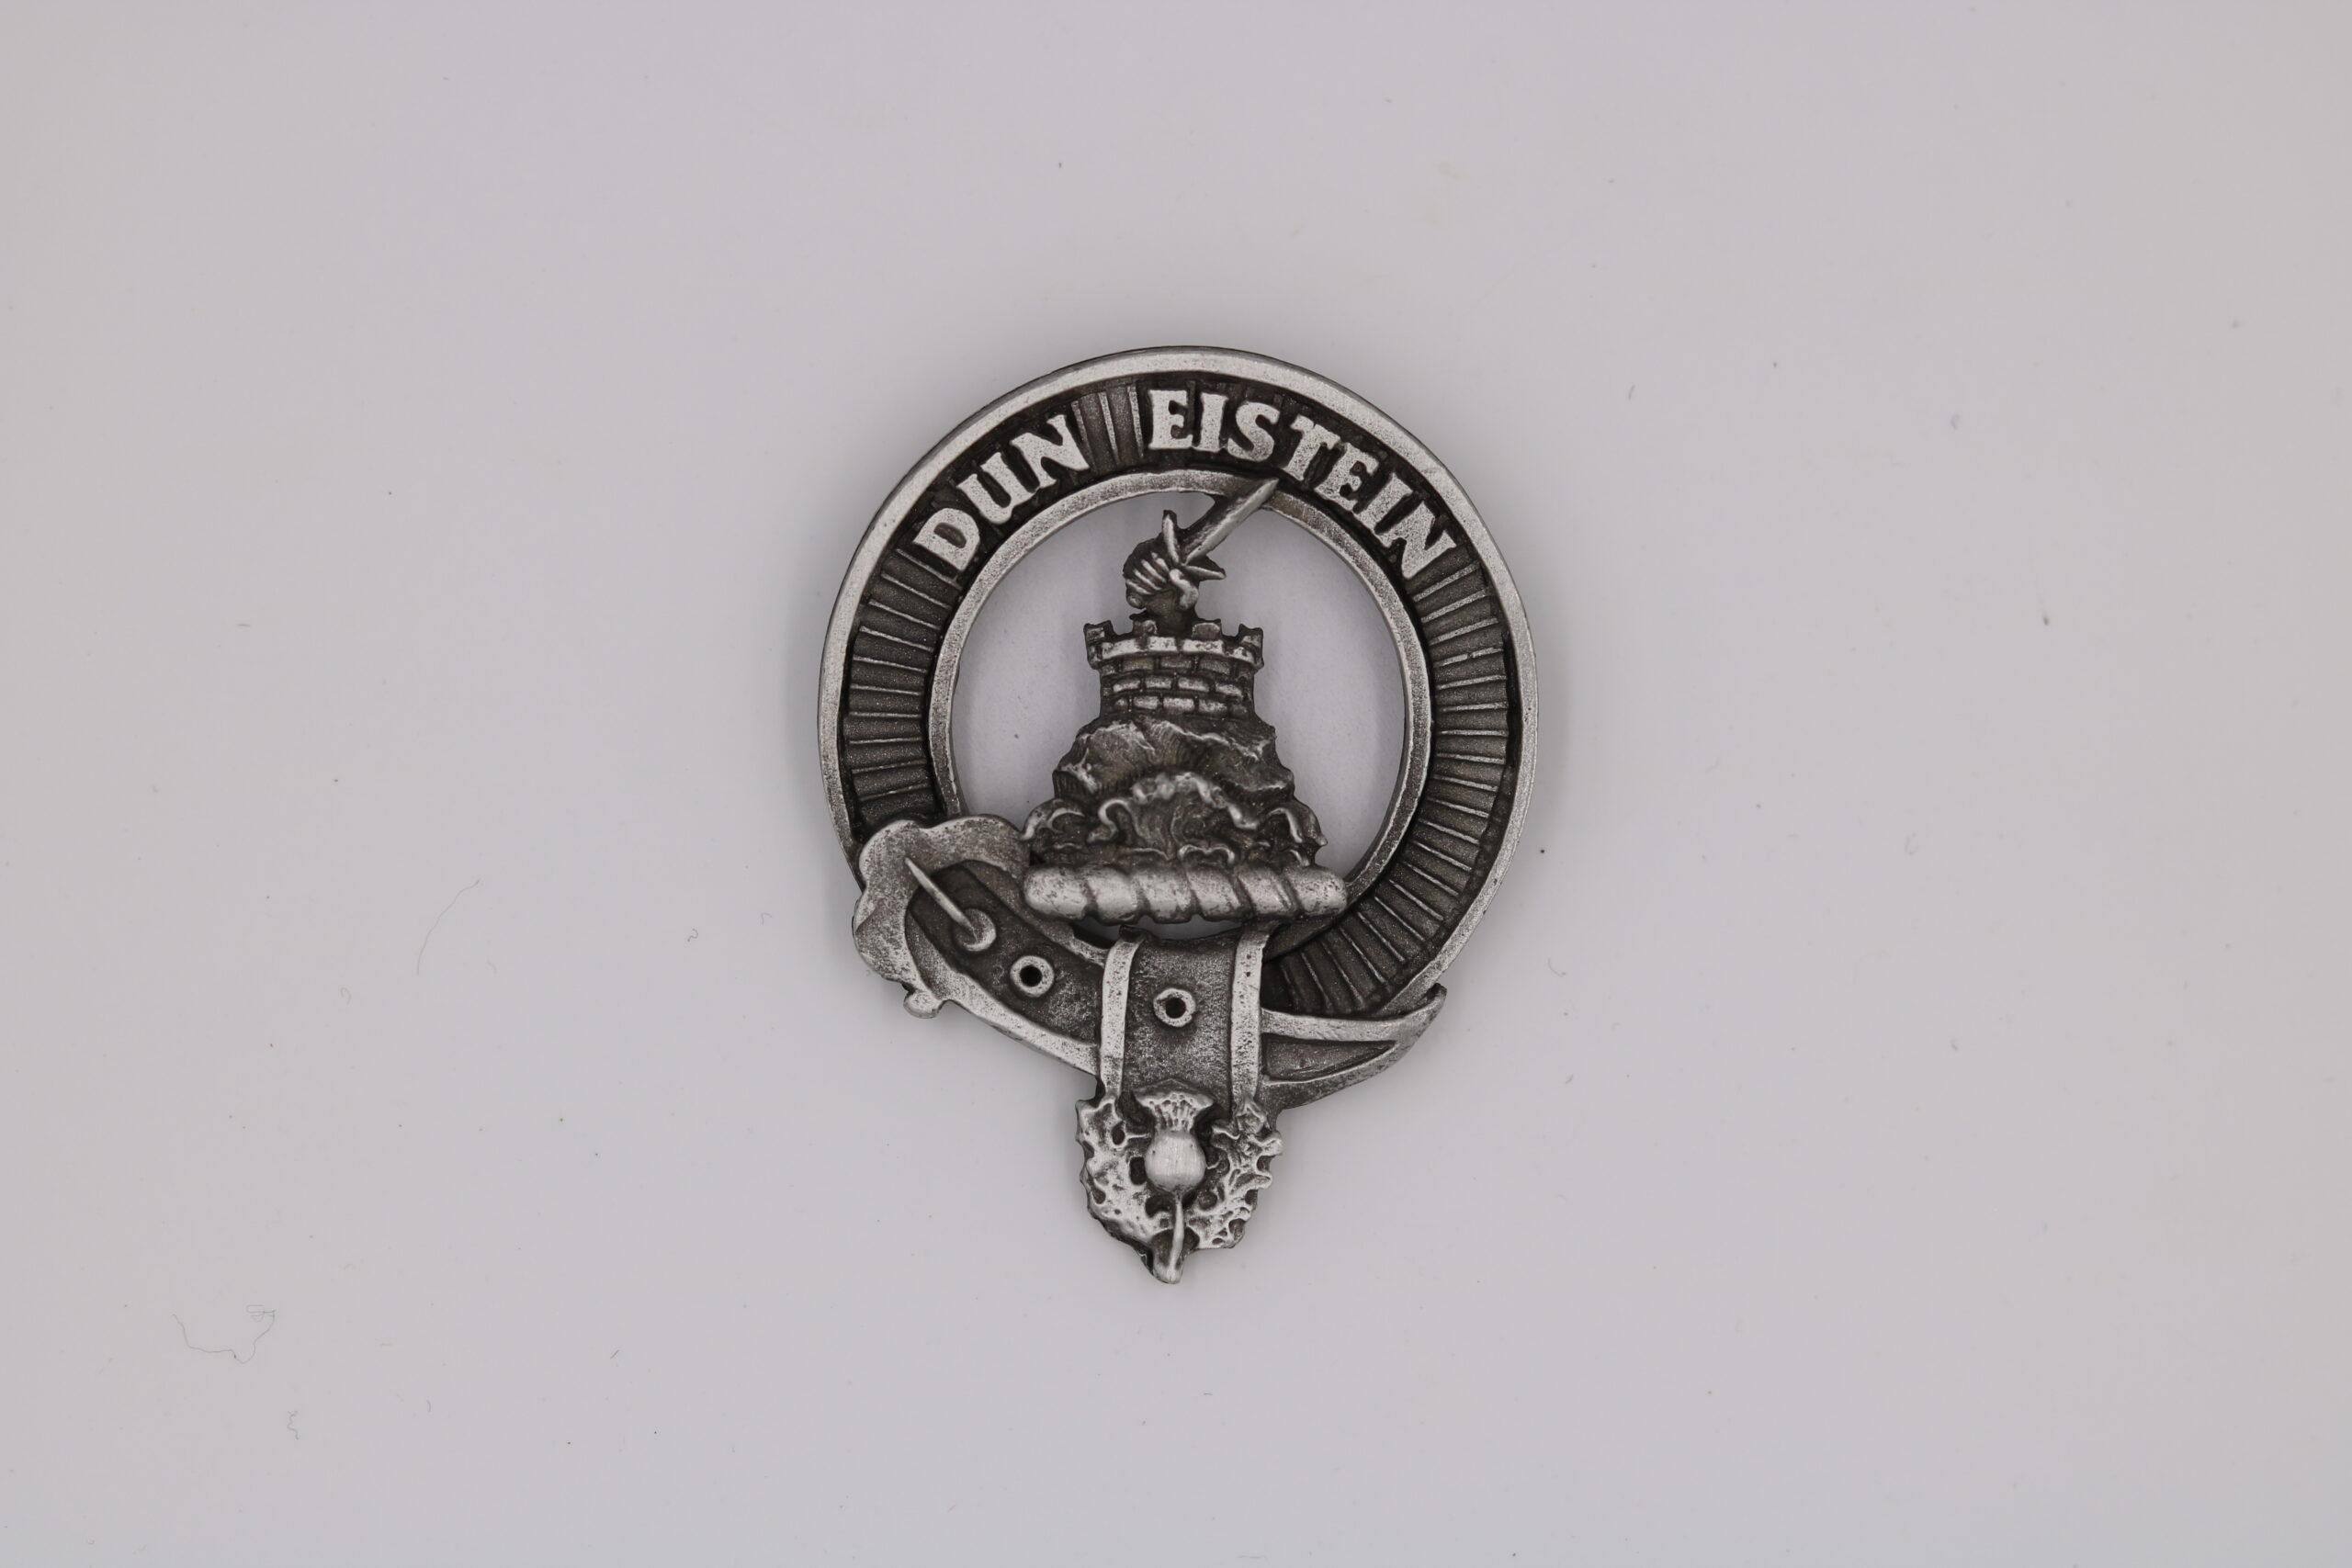 Morrison Scottish Clan Crest Pewter Badge or Kilt Pin